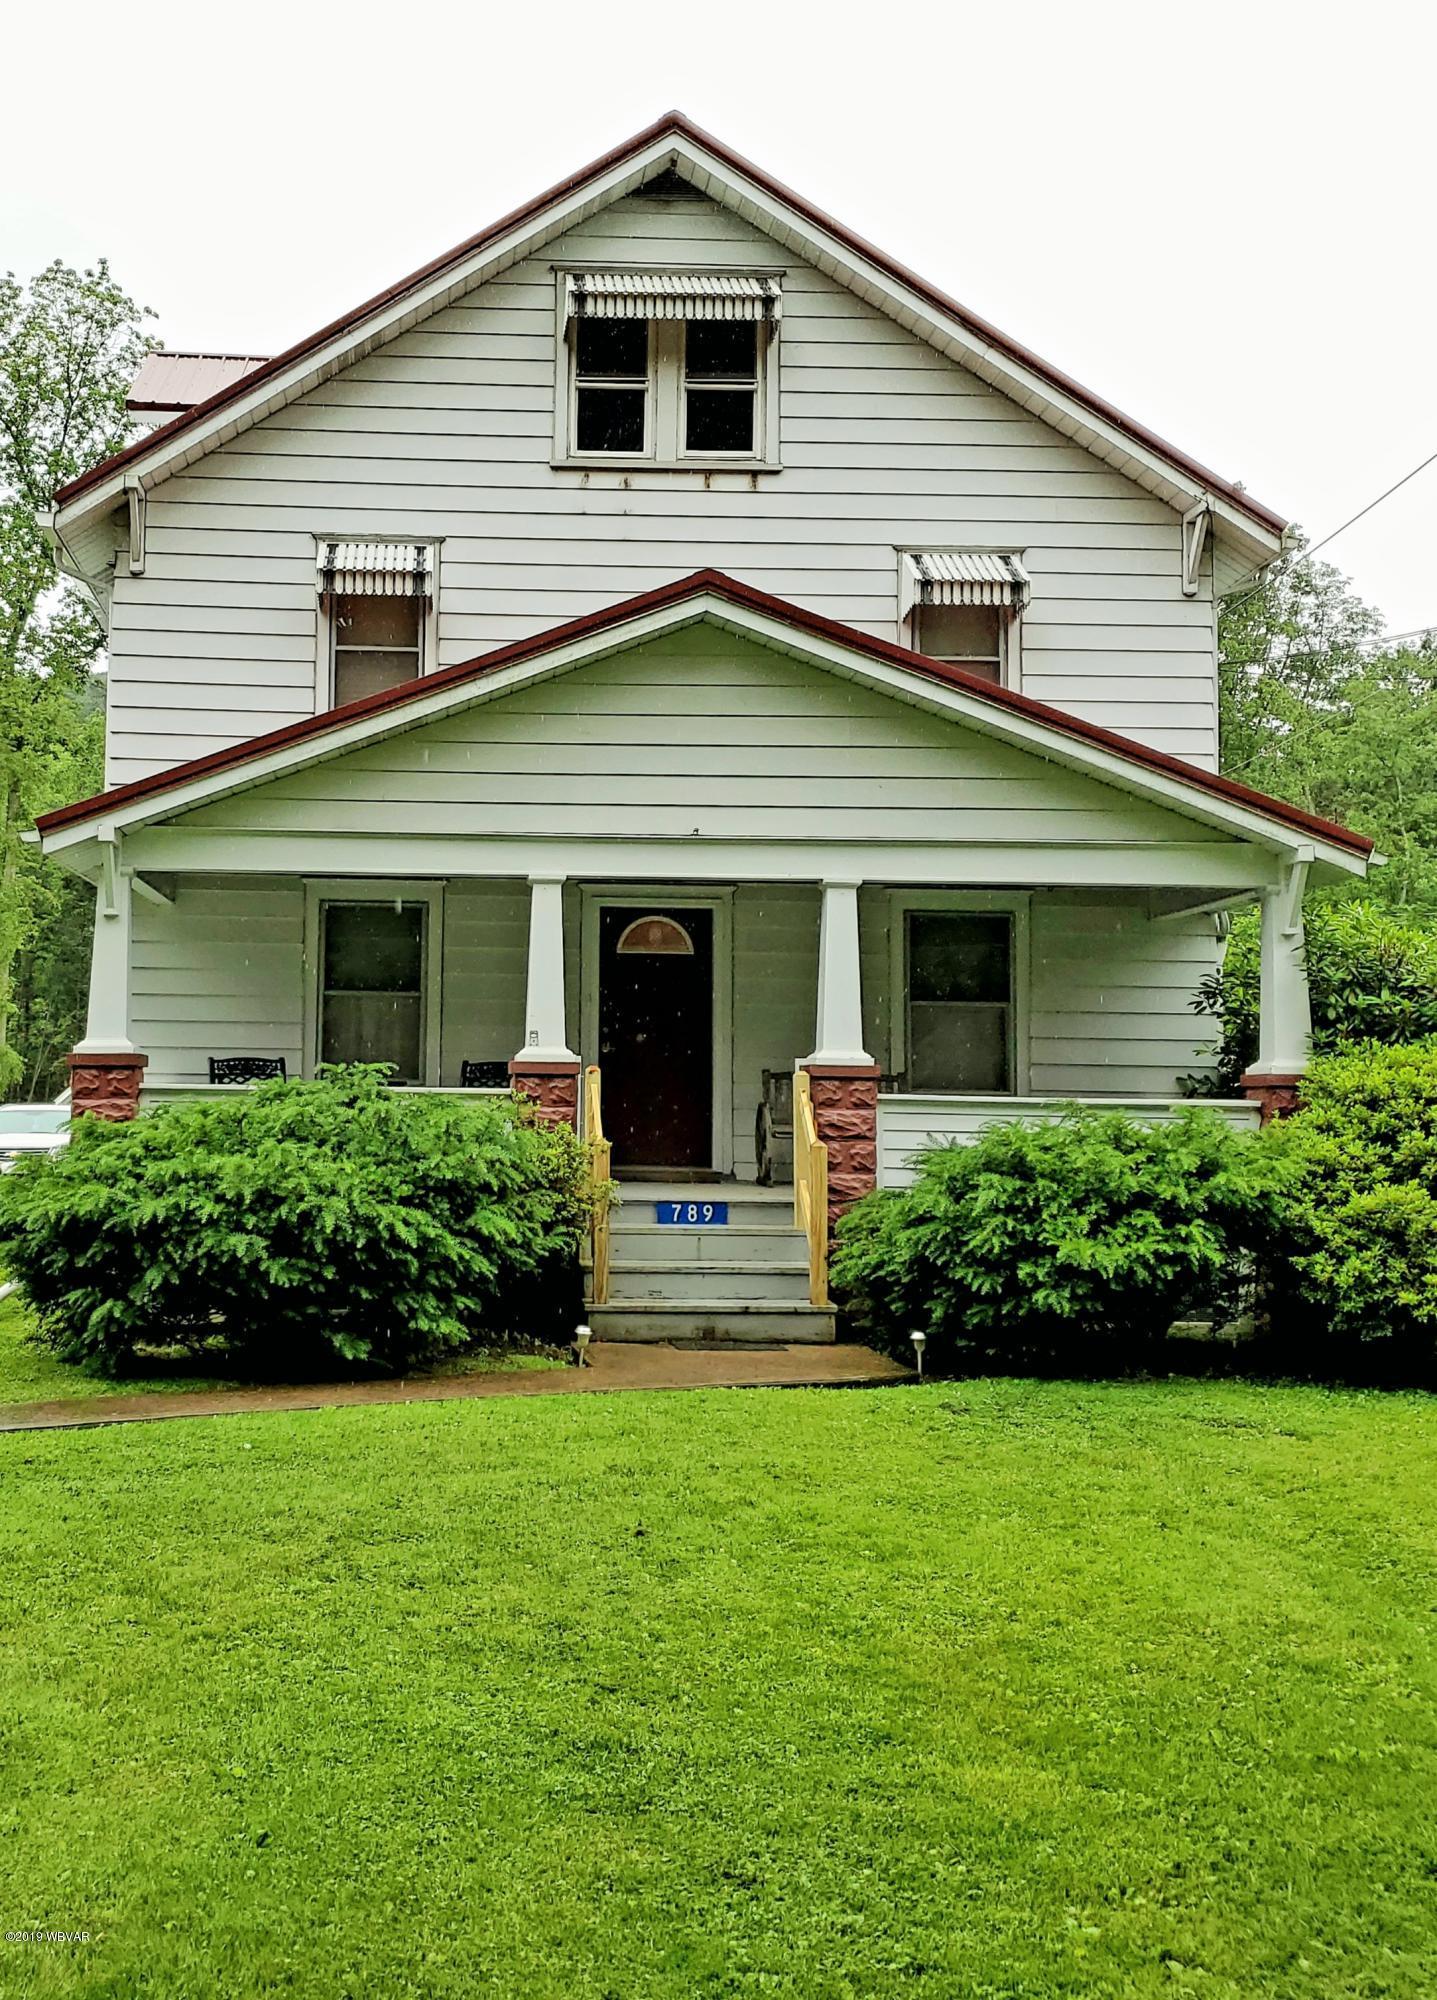 789 PARK AVENUE,Lock Haven,PA 17745,3 Bedrooms Bedrooms,1.25 BathroomsBathrooms,Residential,PARK,WB-87659